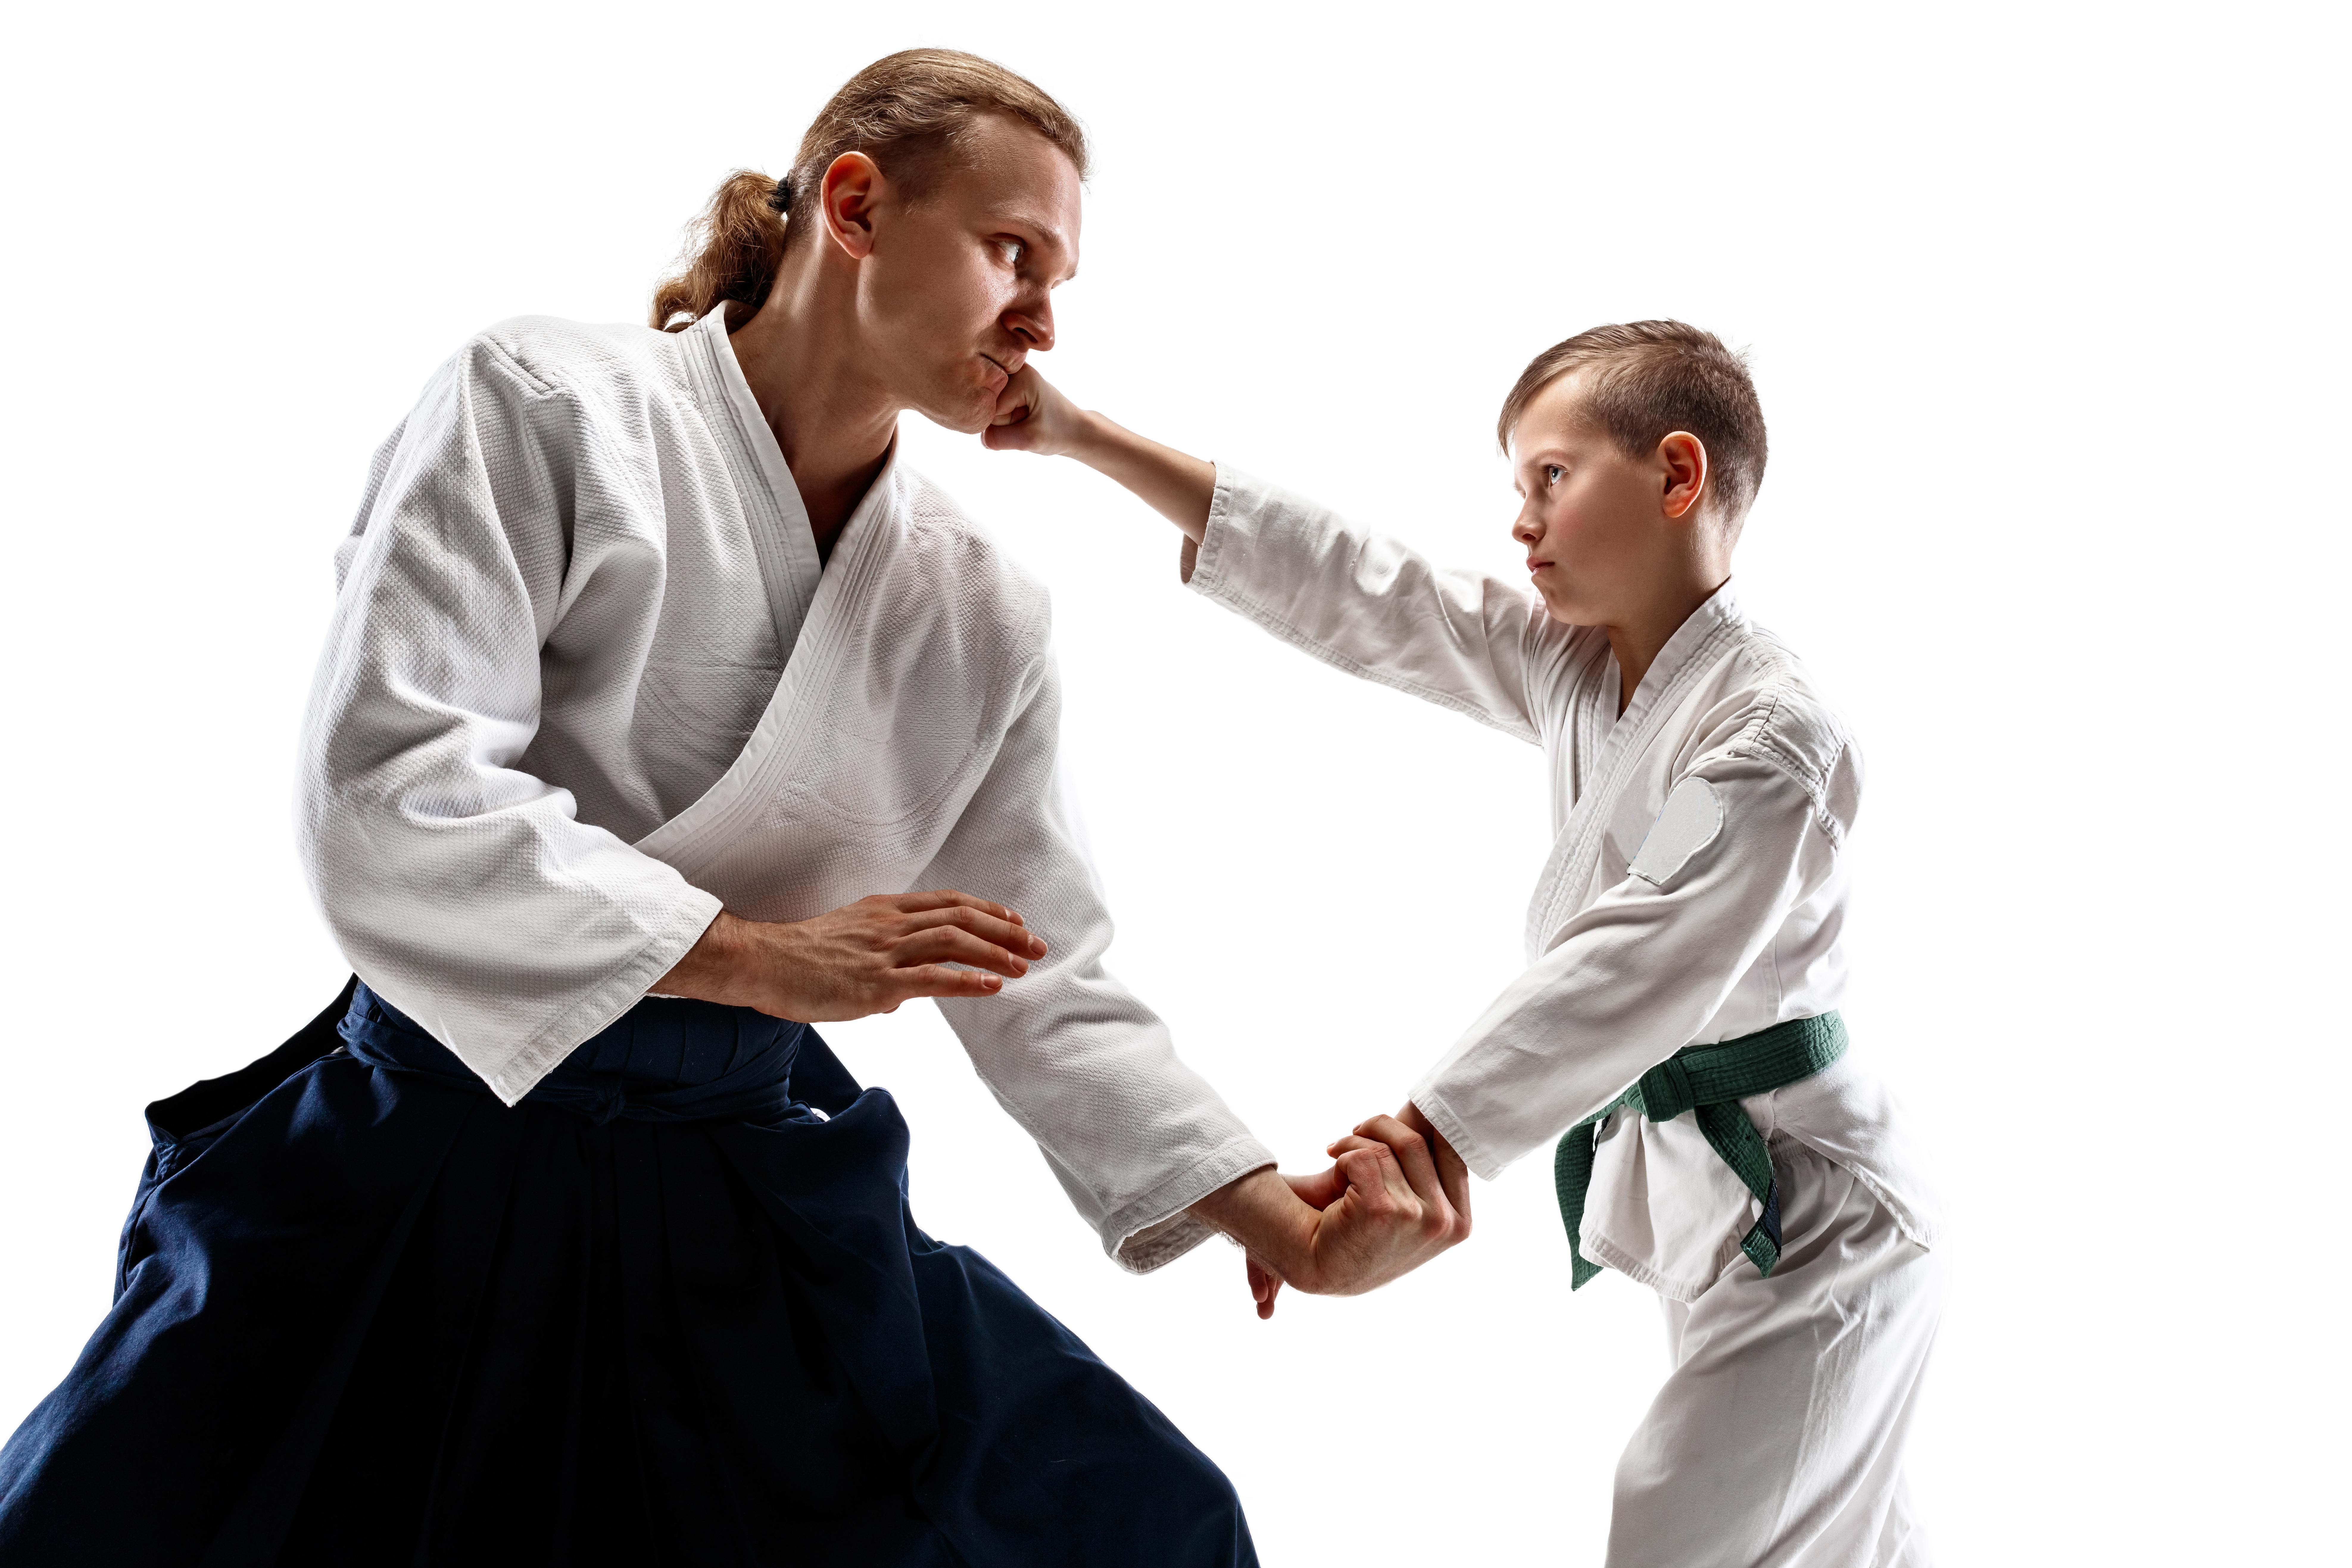 What is the Best Way to Learn Jiu Jitsu?